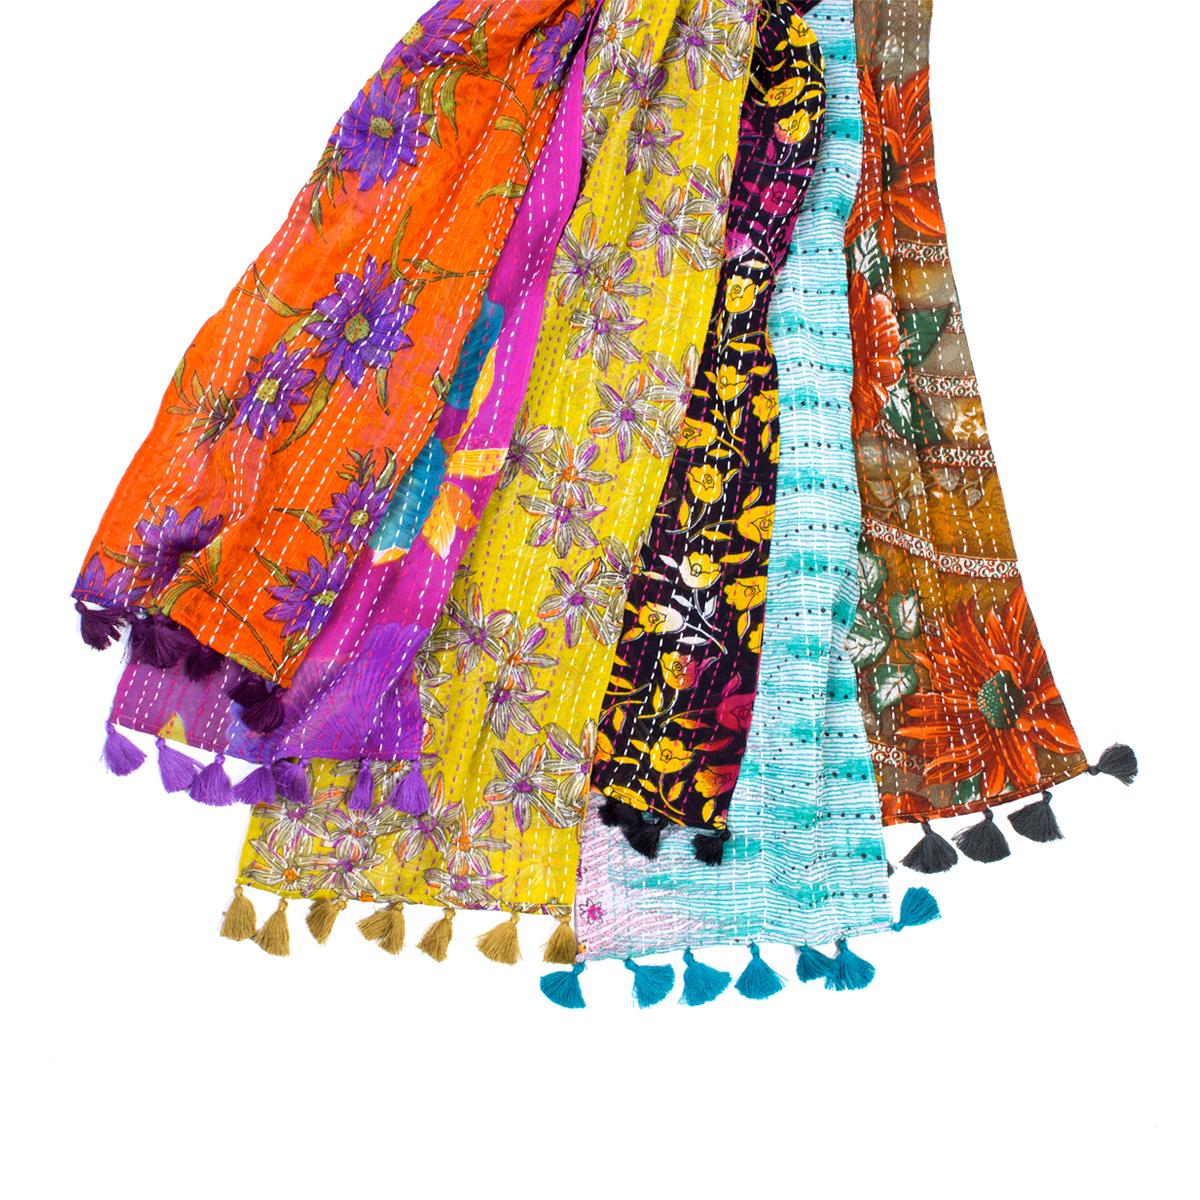 uns631_sari_kantha_scarf1_1200.jpg